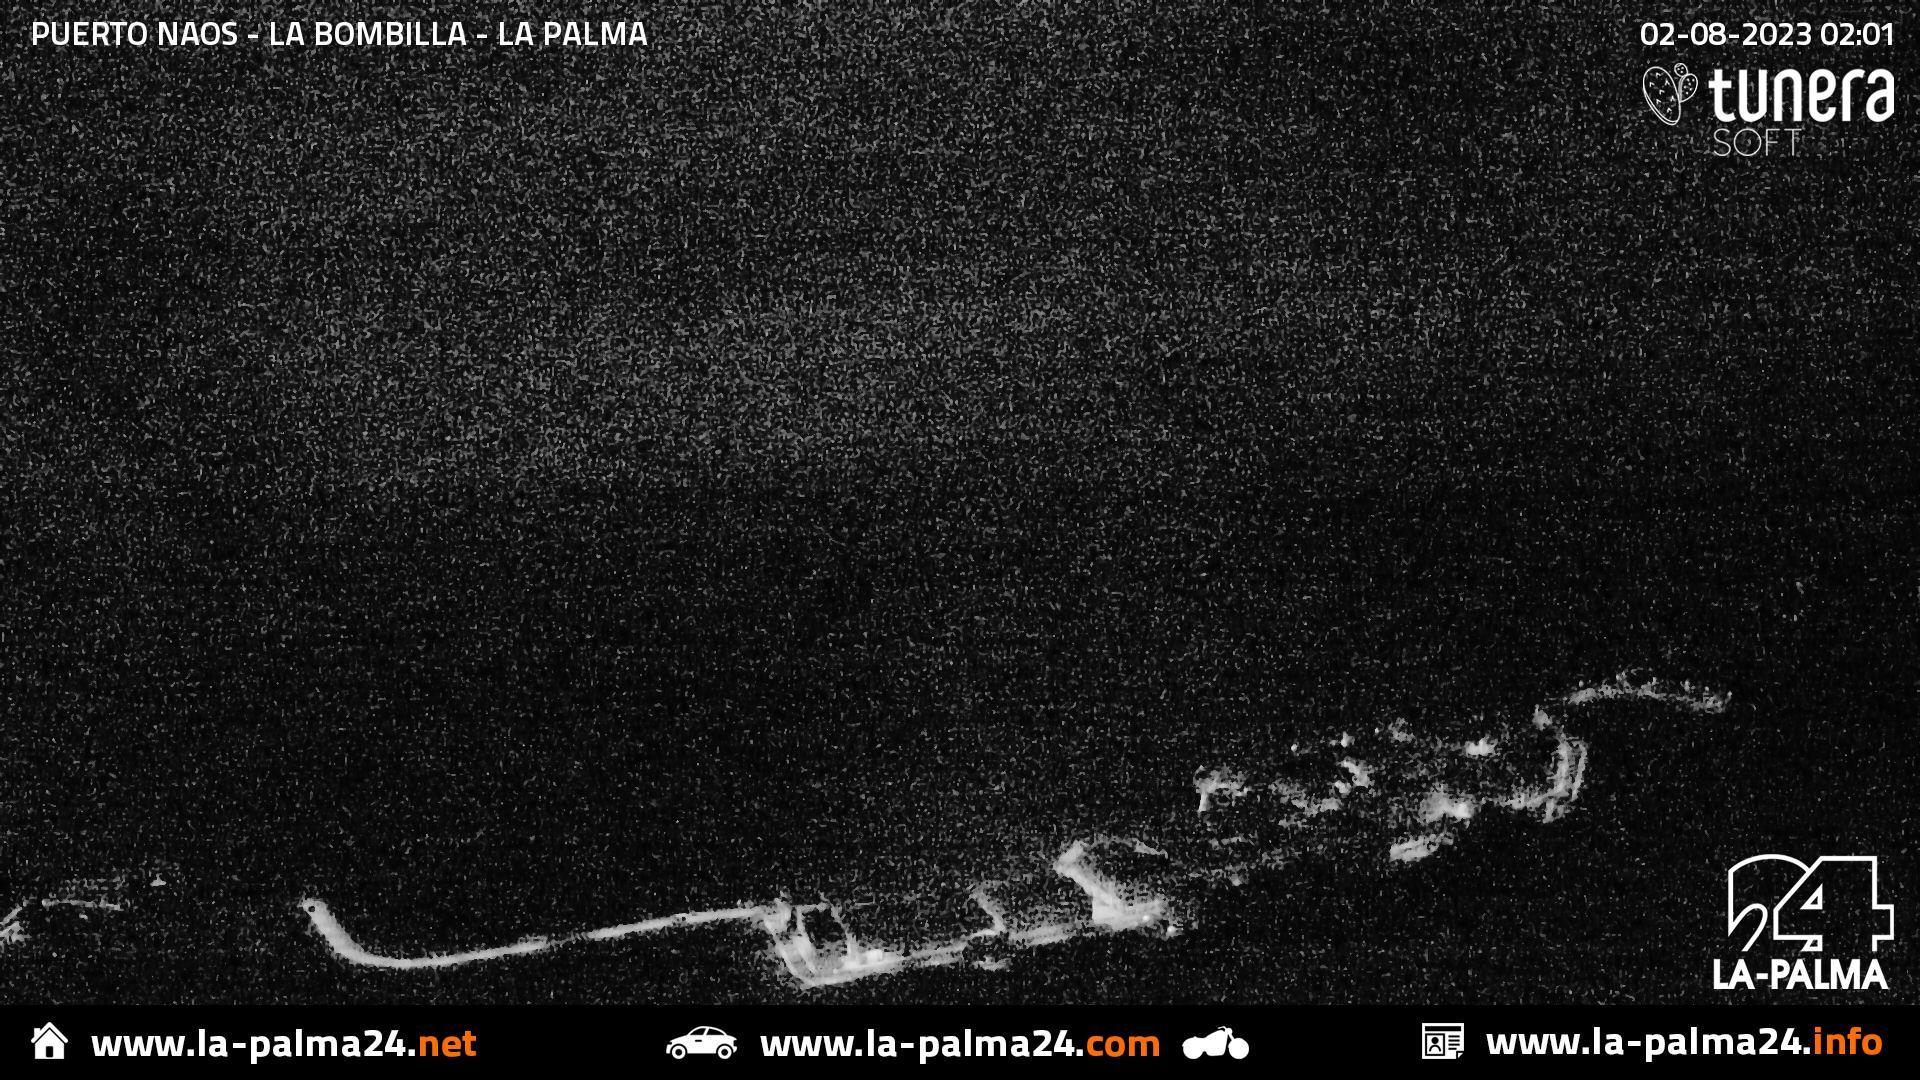 Puerto Naos Webcam Live